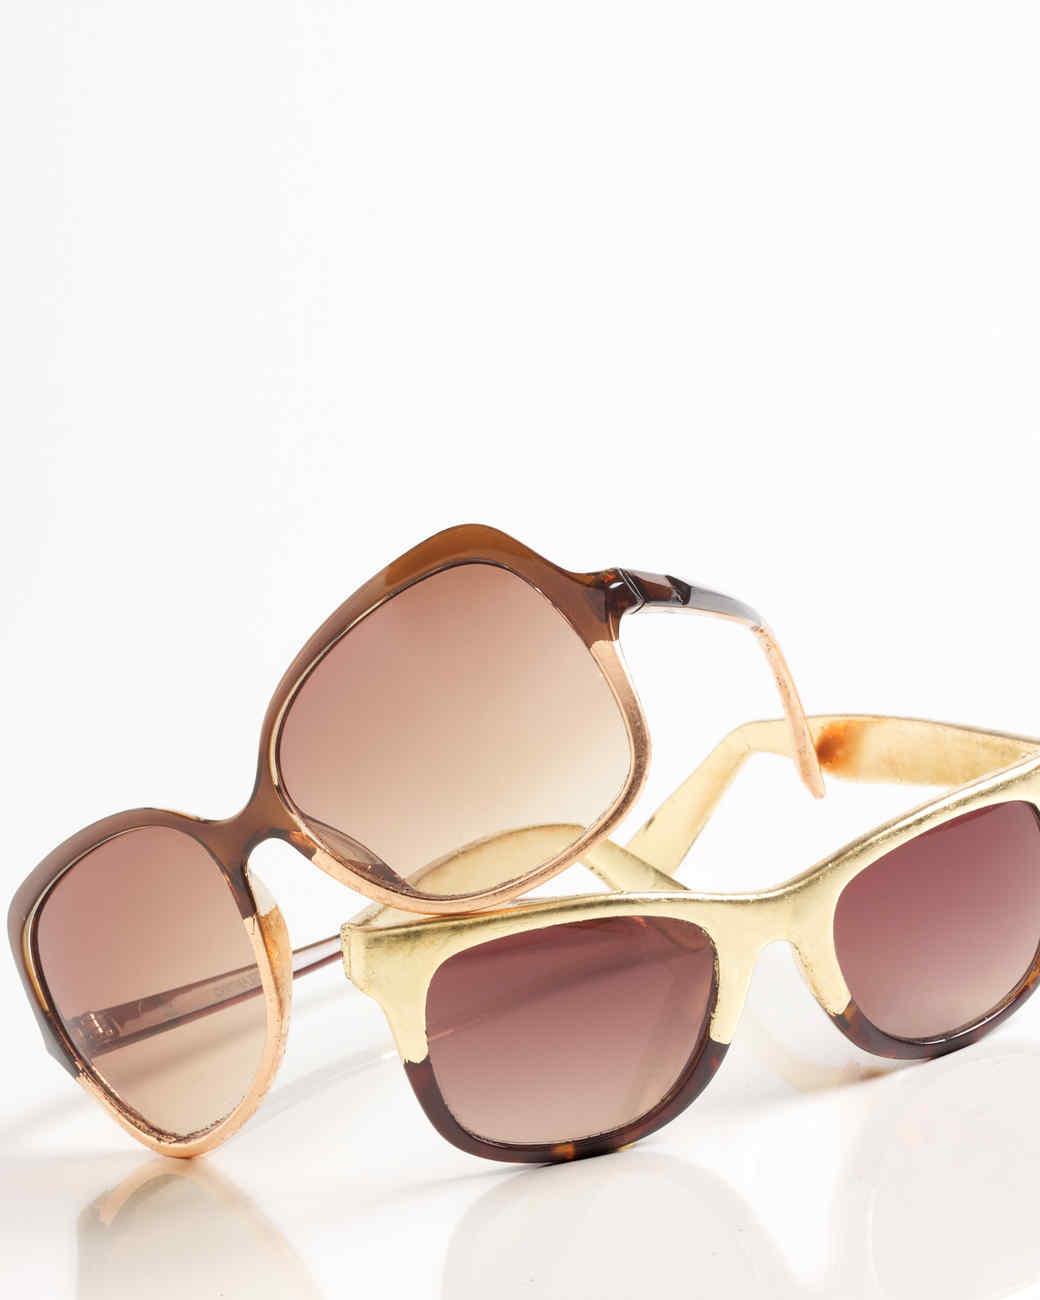 mscrafts-holiday14-fashionista-sunglasses-1014.jpg